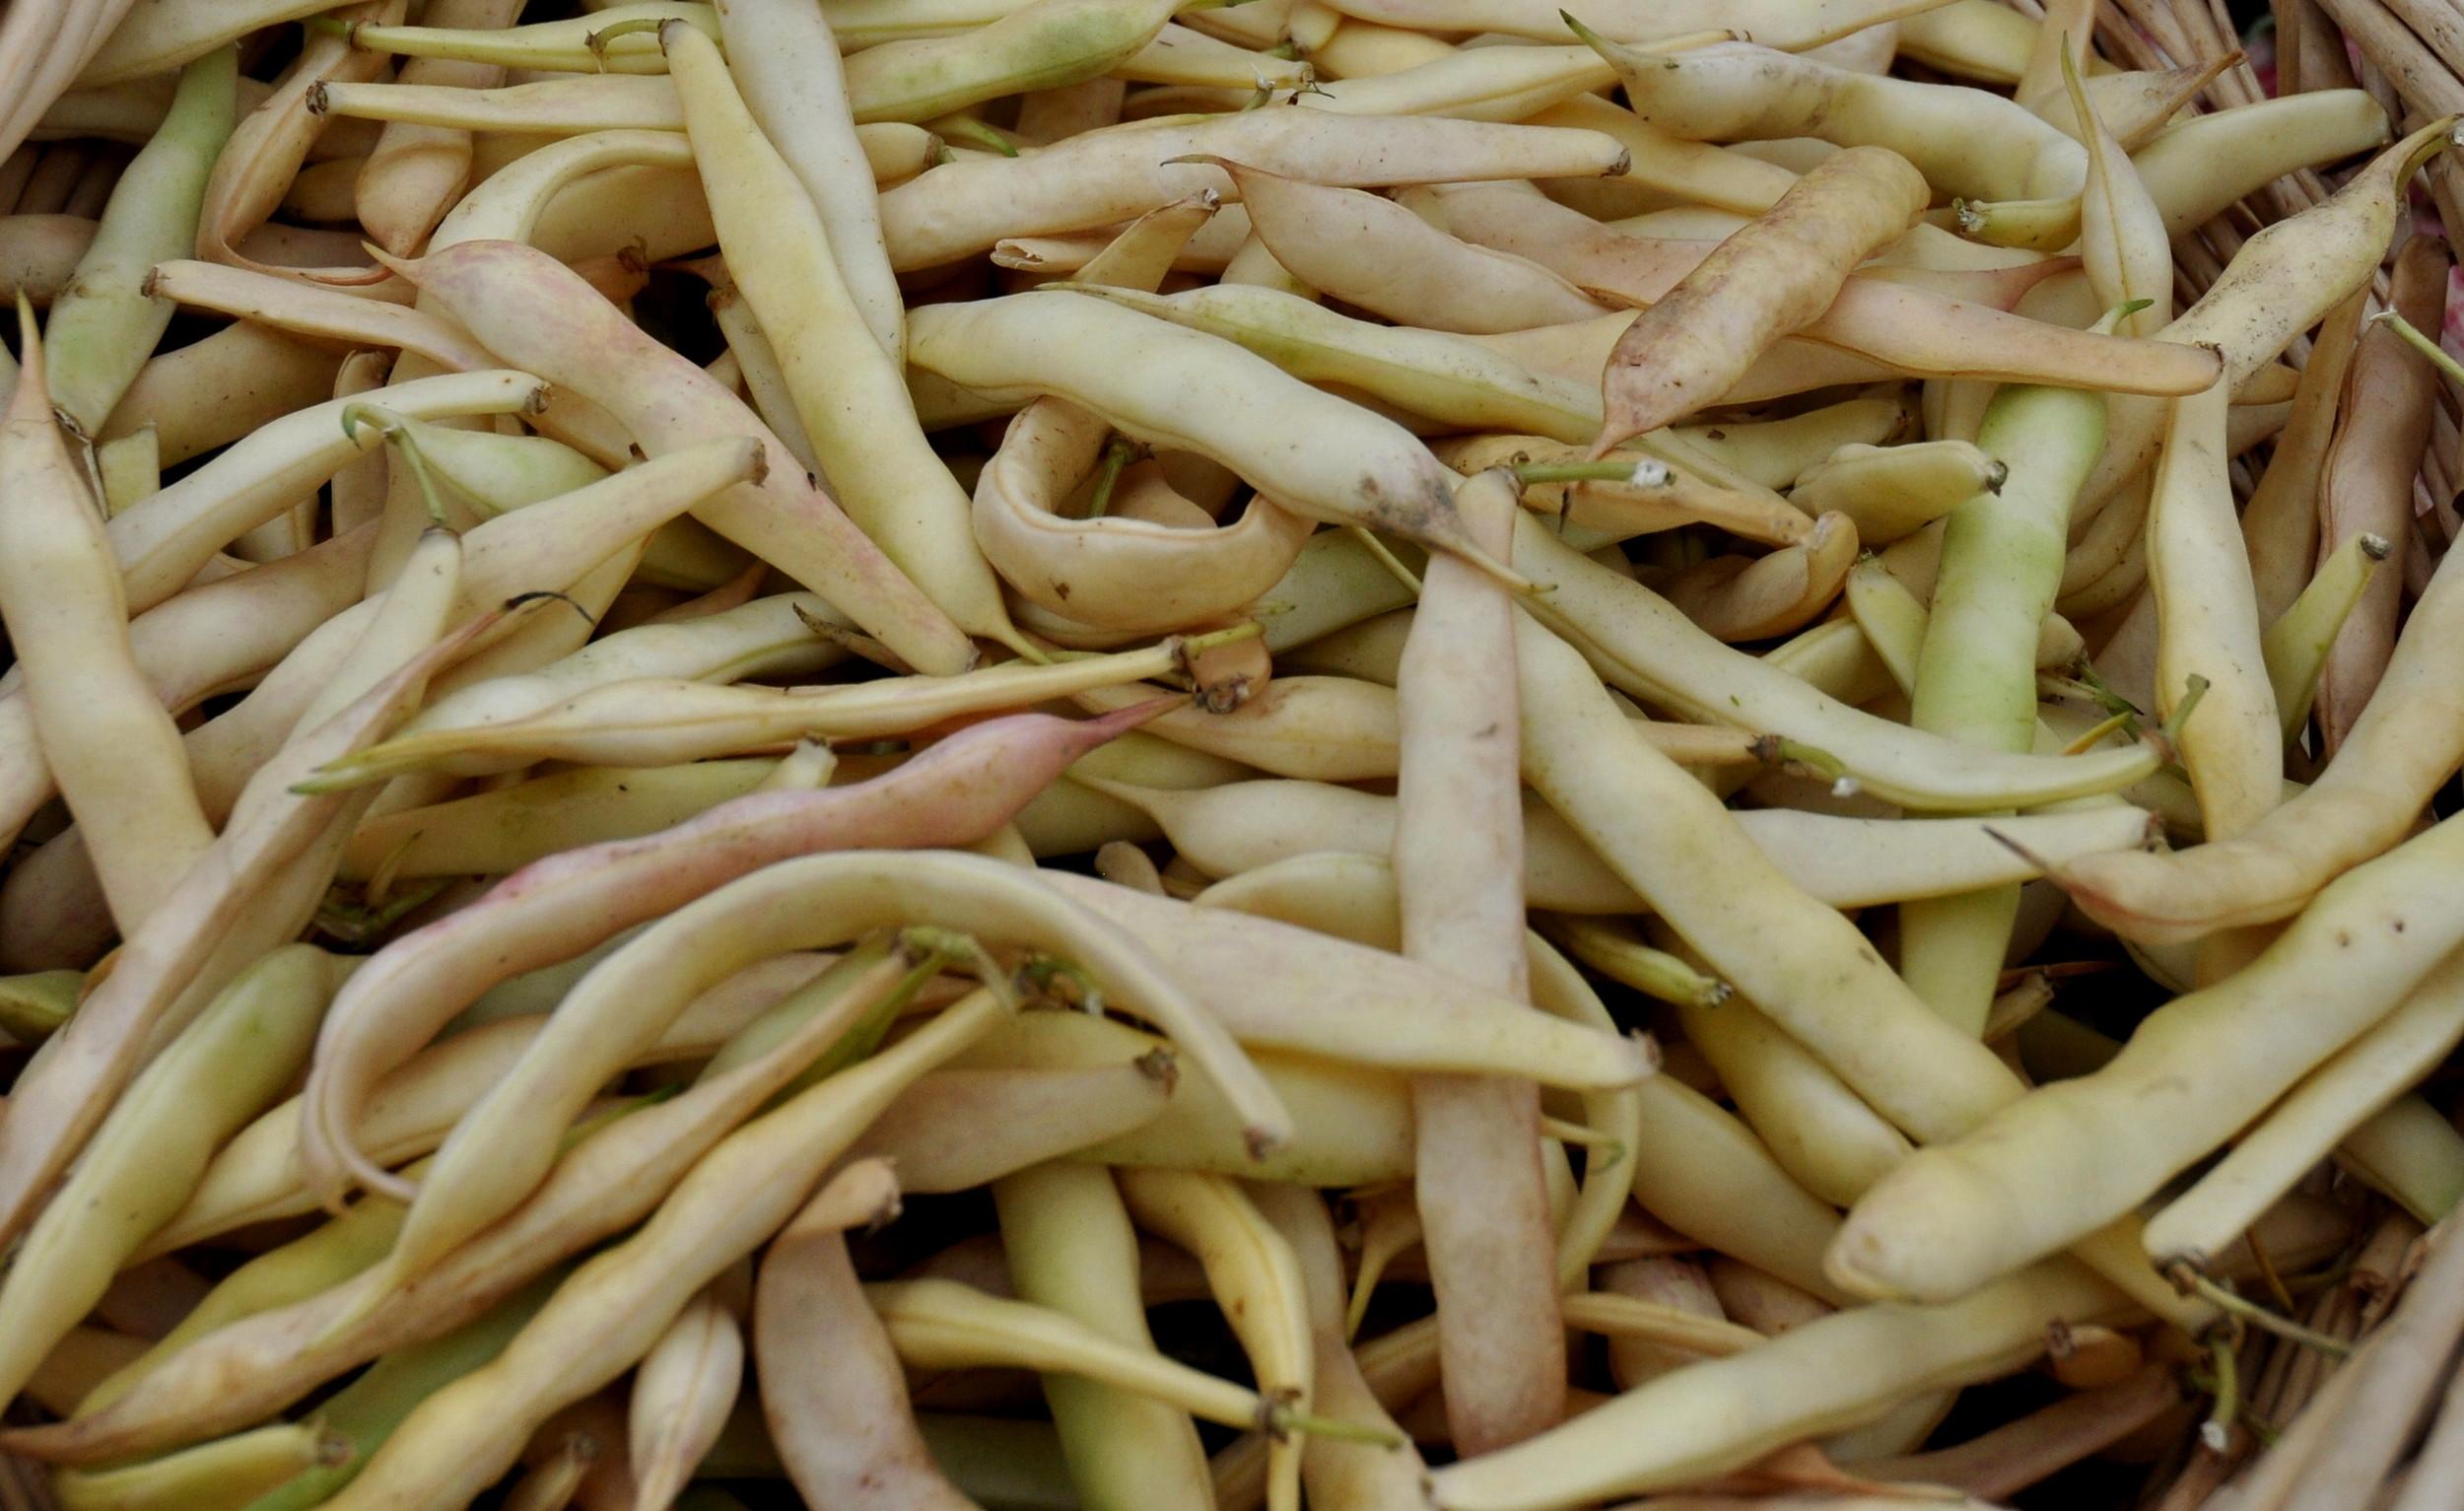 Fresh cannellini shelling beans from One Leaf Farm at Ballard Farmers Market. Copyright Zachary D. Lyons.